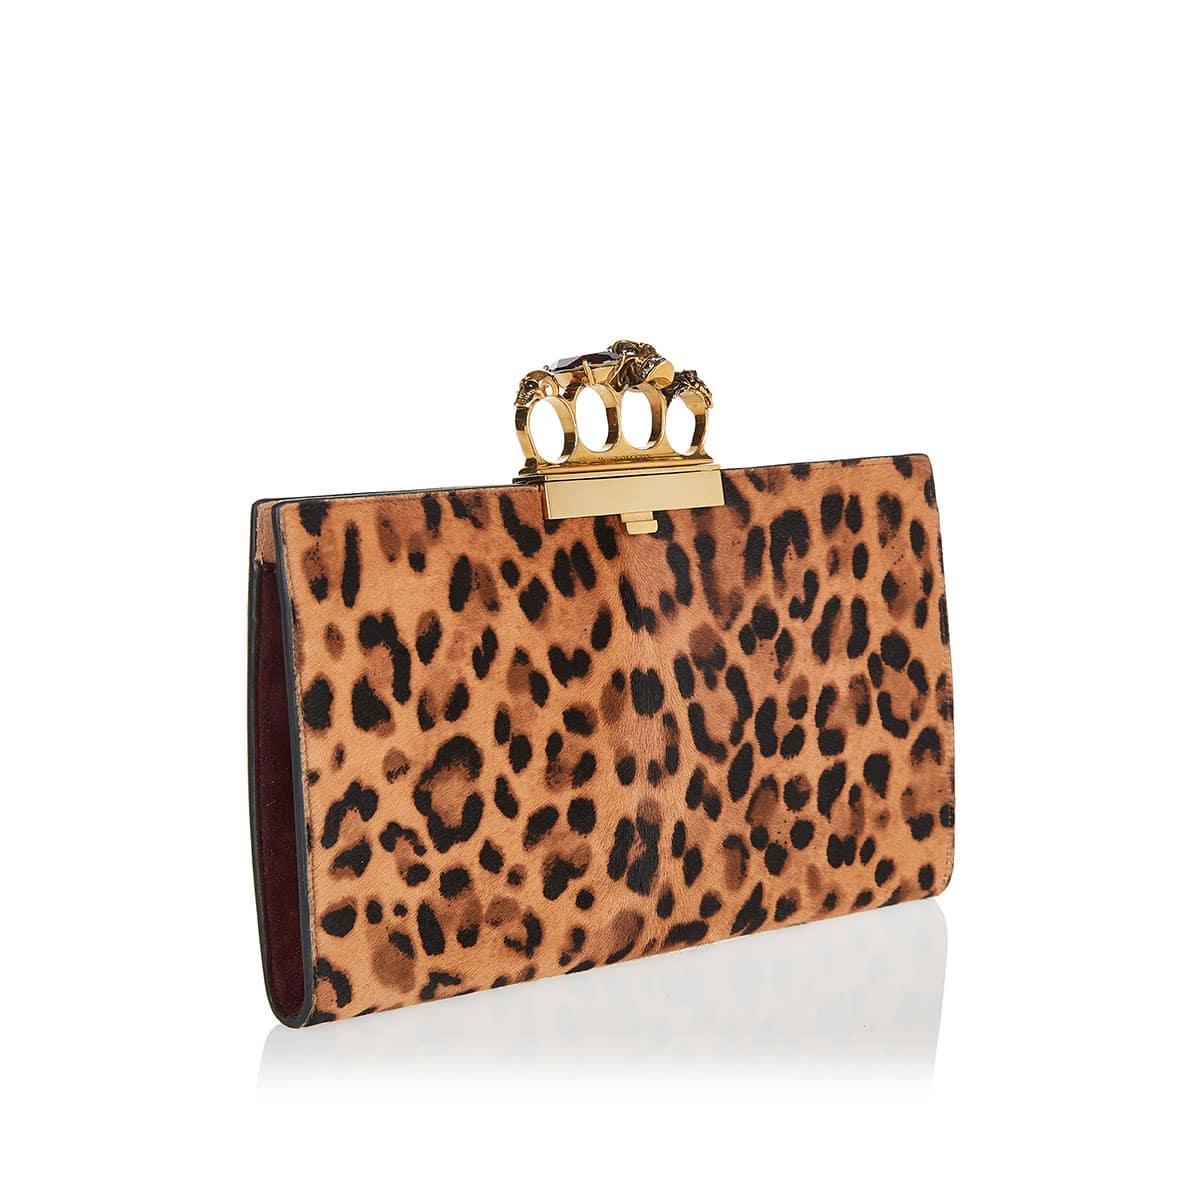 Four ring leopard clutch